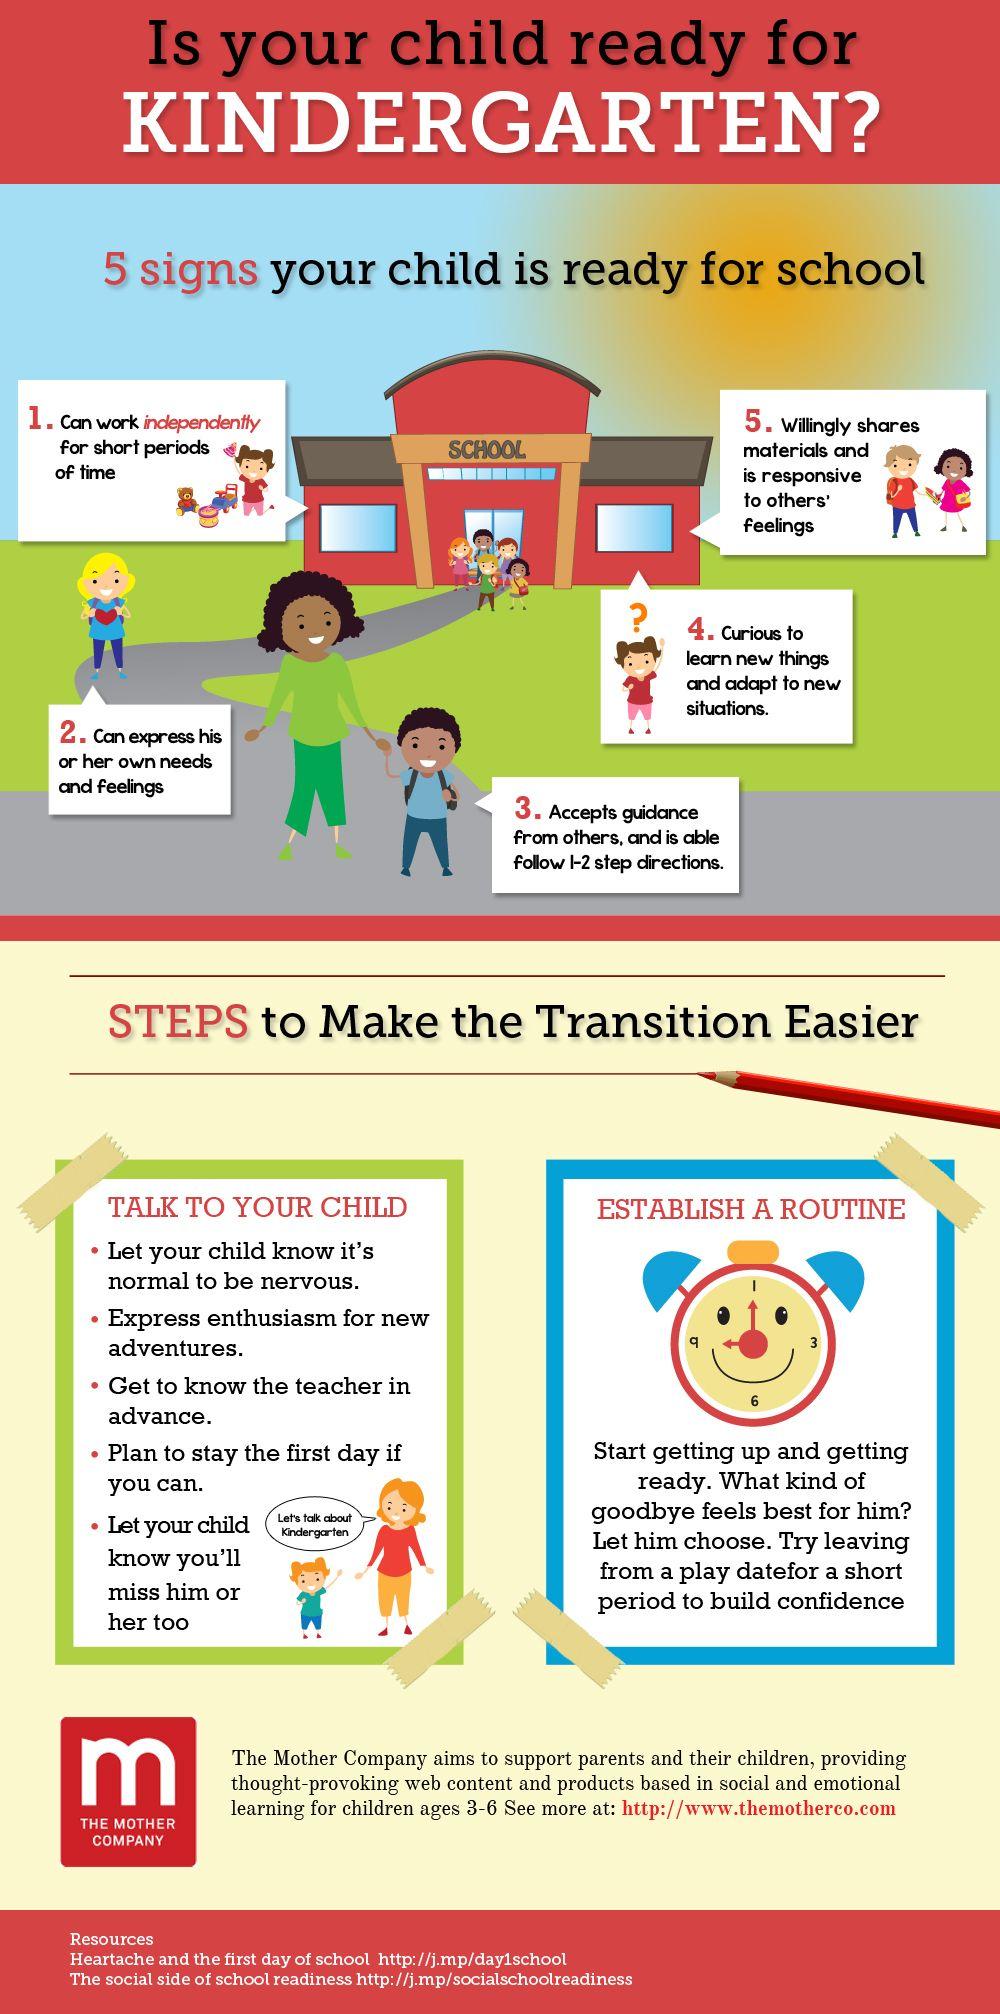 Kinder Garden: Is Your Child Ready For Kindergarten? #infographic